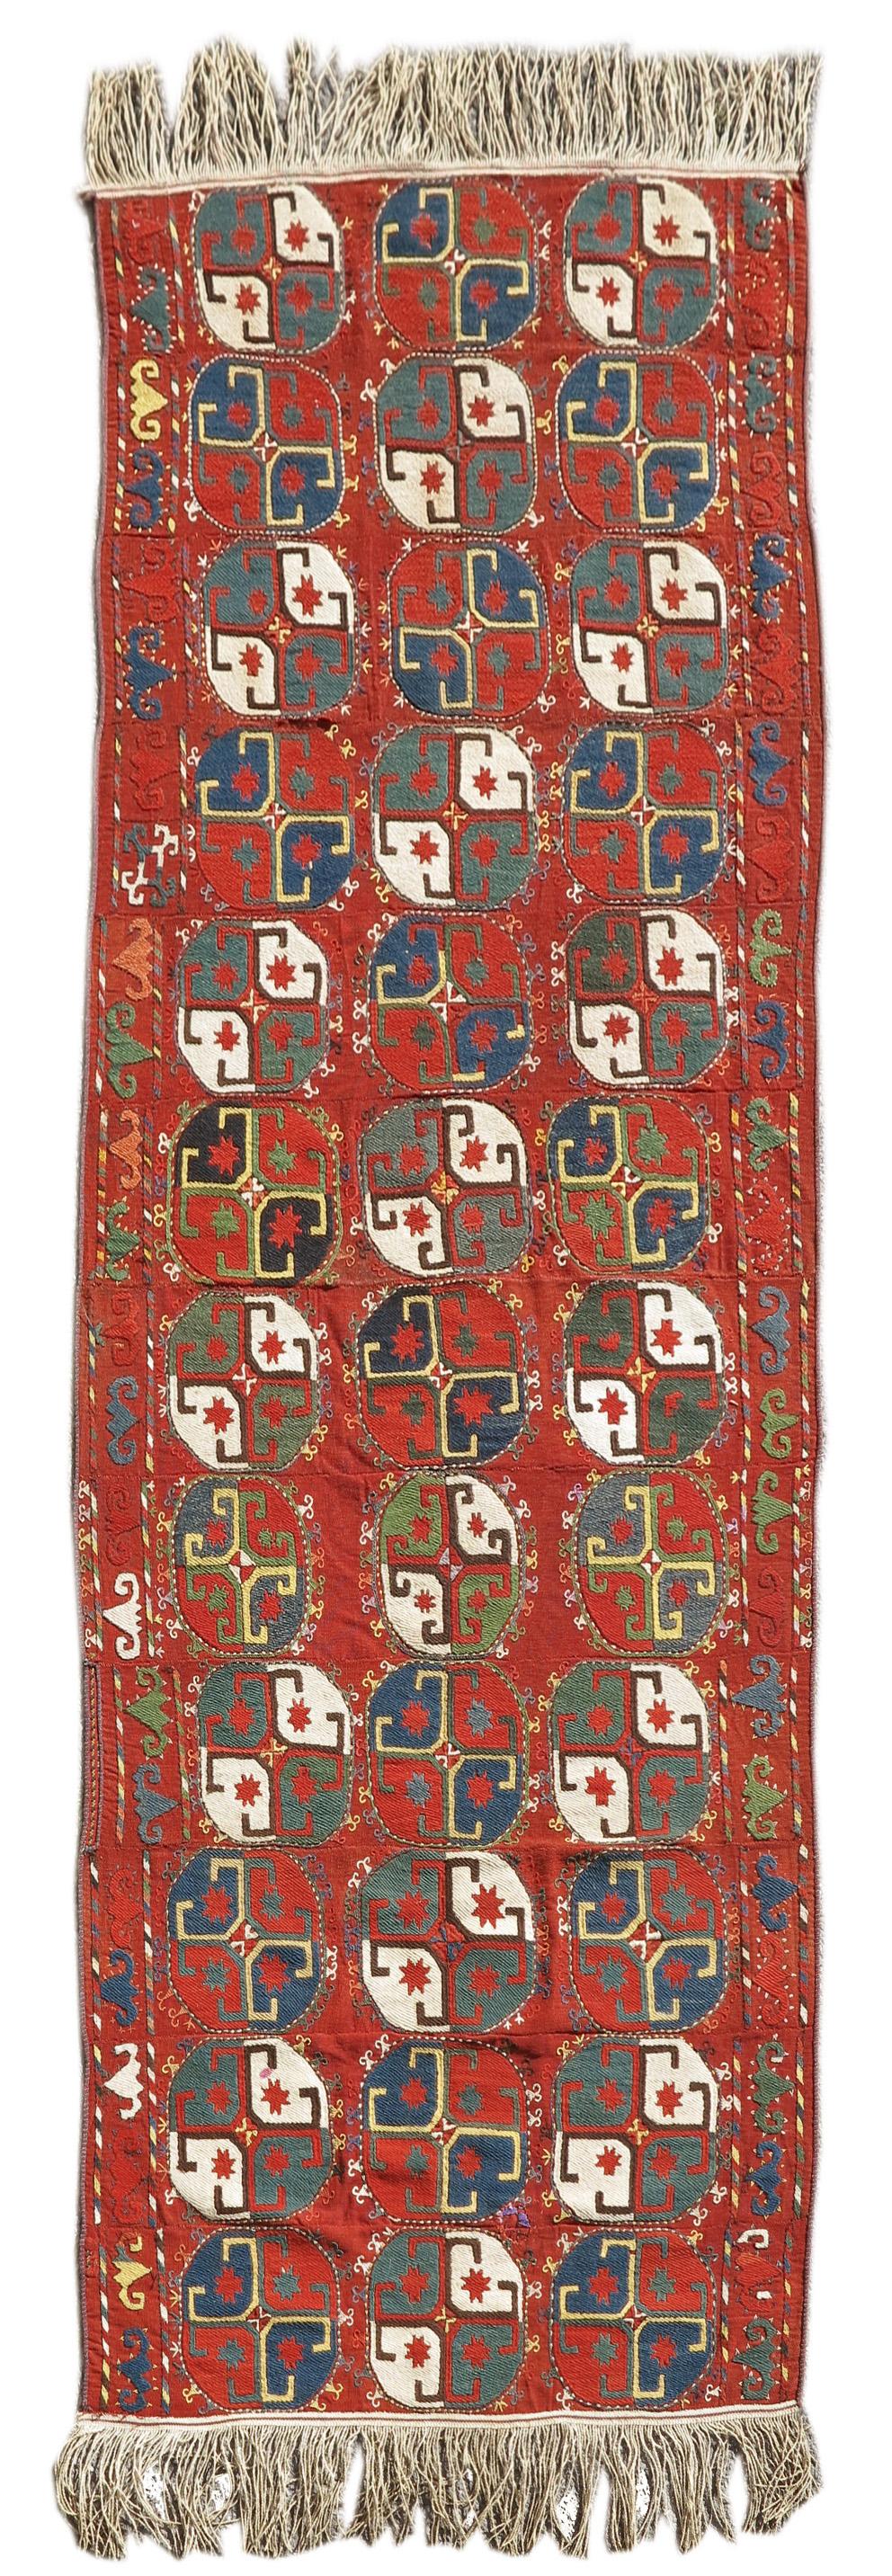 Uzbek mixed technique flatwoven rug